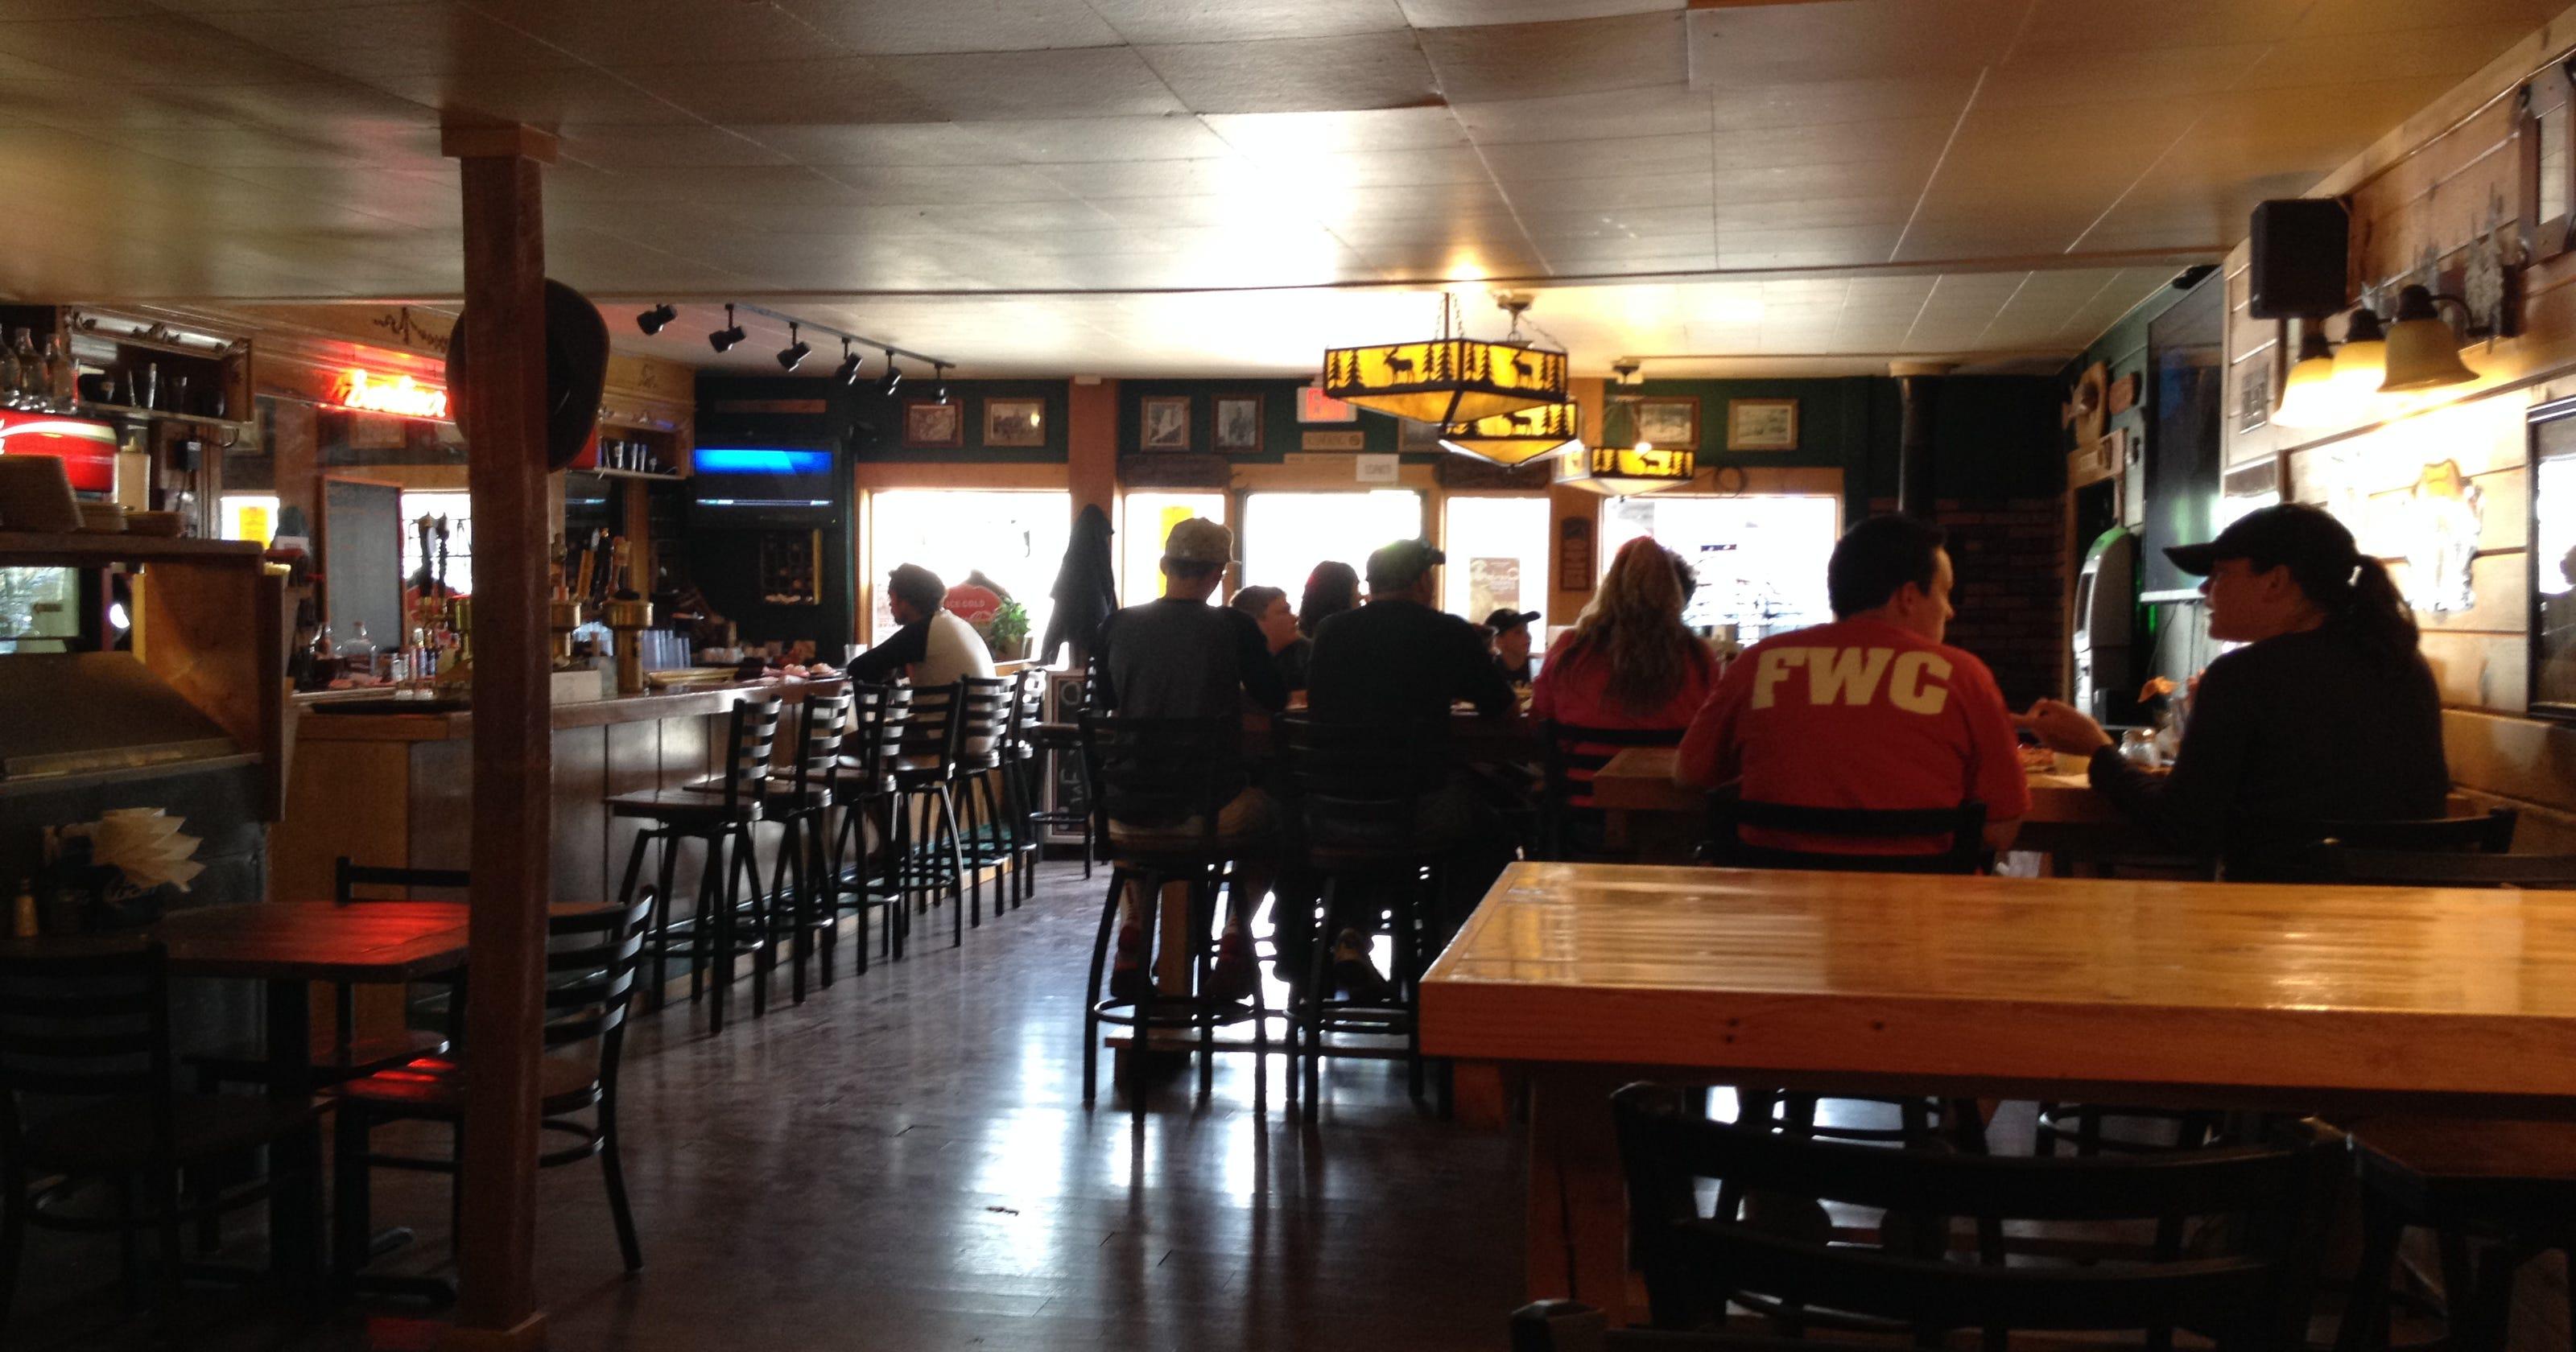 Veldig K-Bar Pizza: Gardiner landmark sits at gateway to Yellowstone VK-52